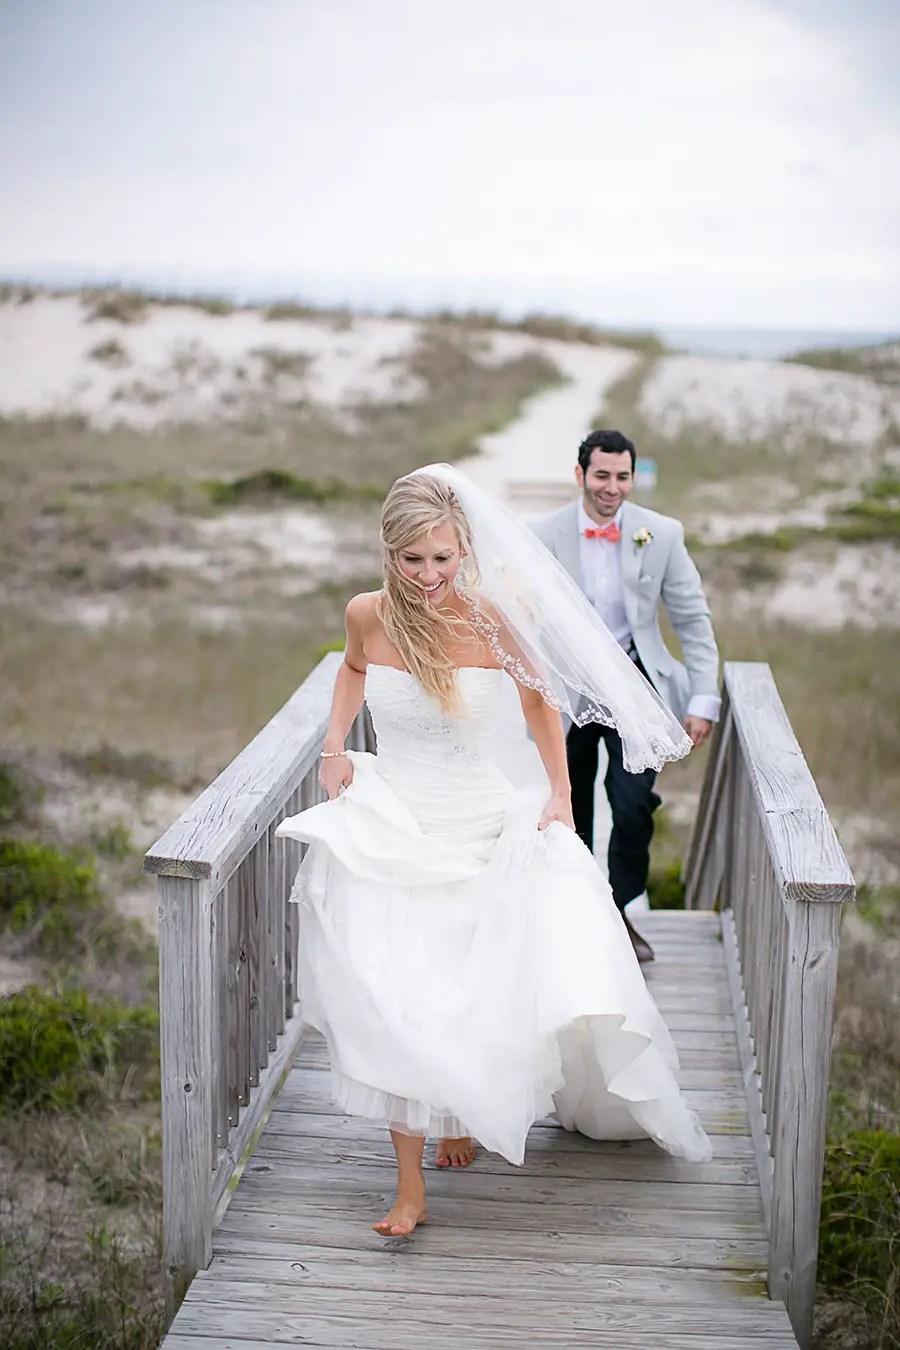 The Bride and Groom - Portraits - 17 - Bald Head Island Wedding - Photo by Eric Boneske